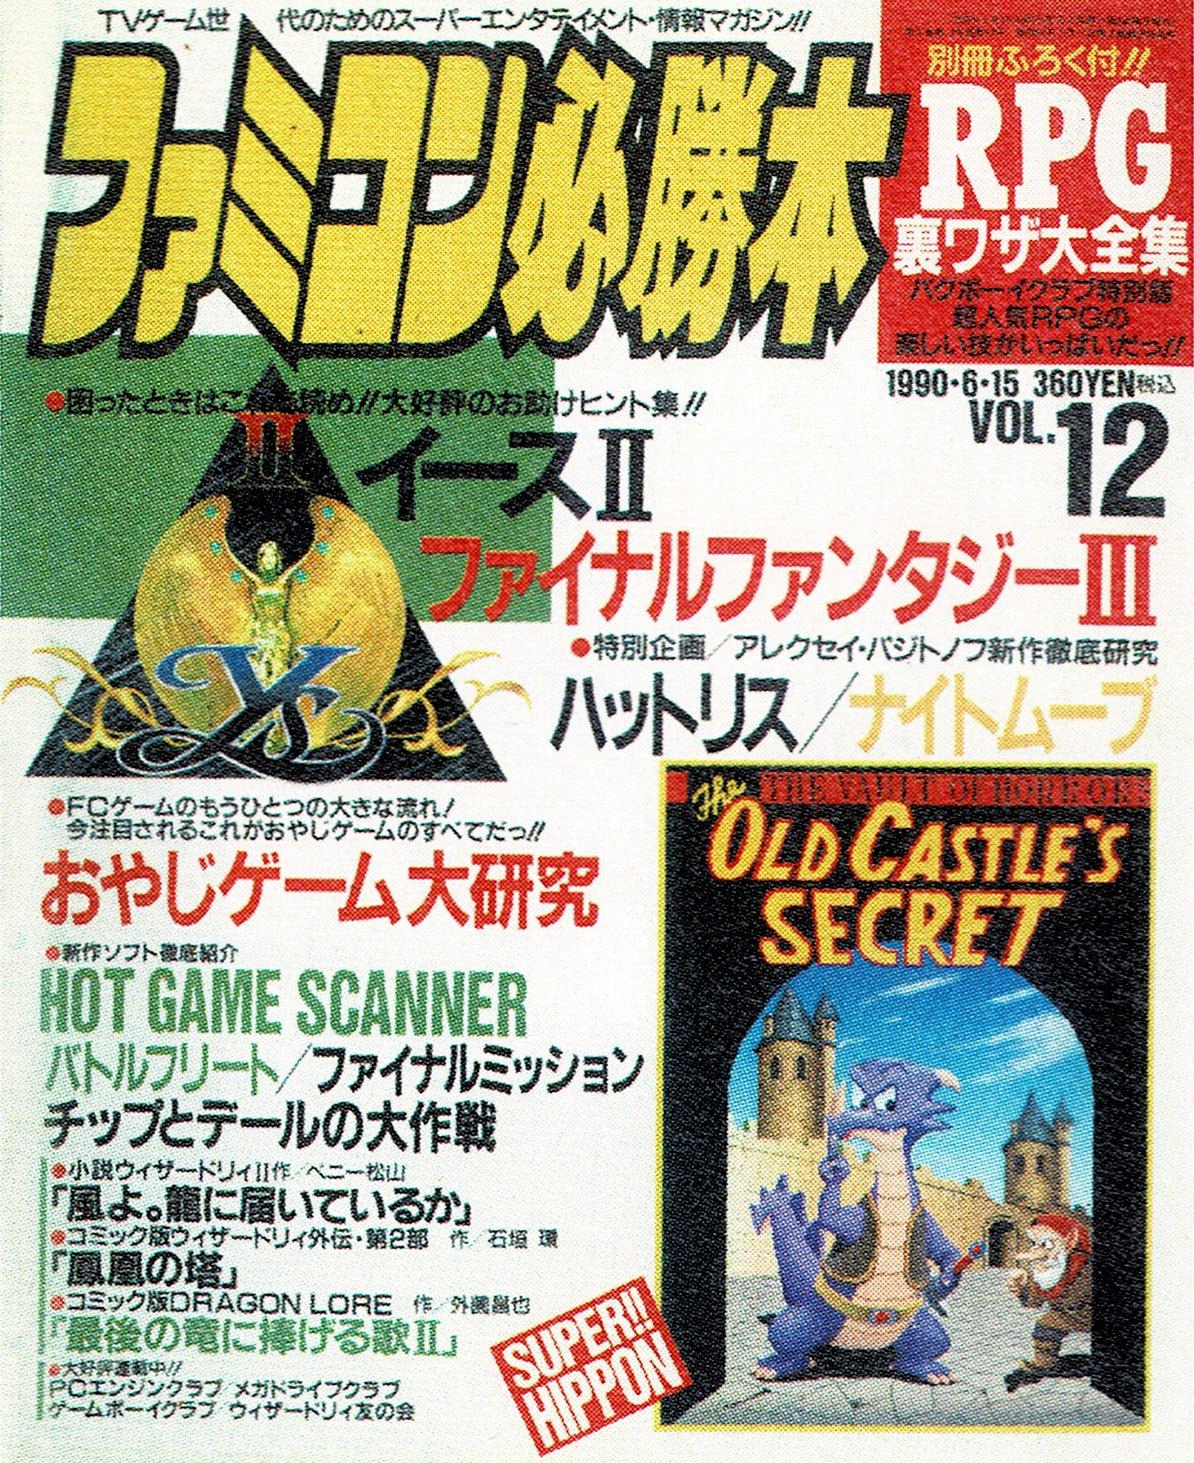 Famicom Hisshoubon Issue 097 (June 15, 1990)